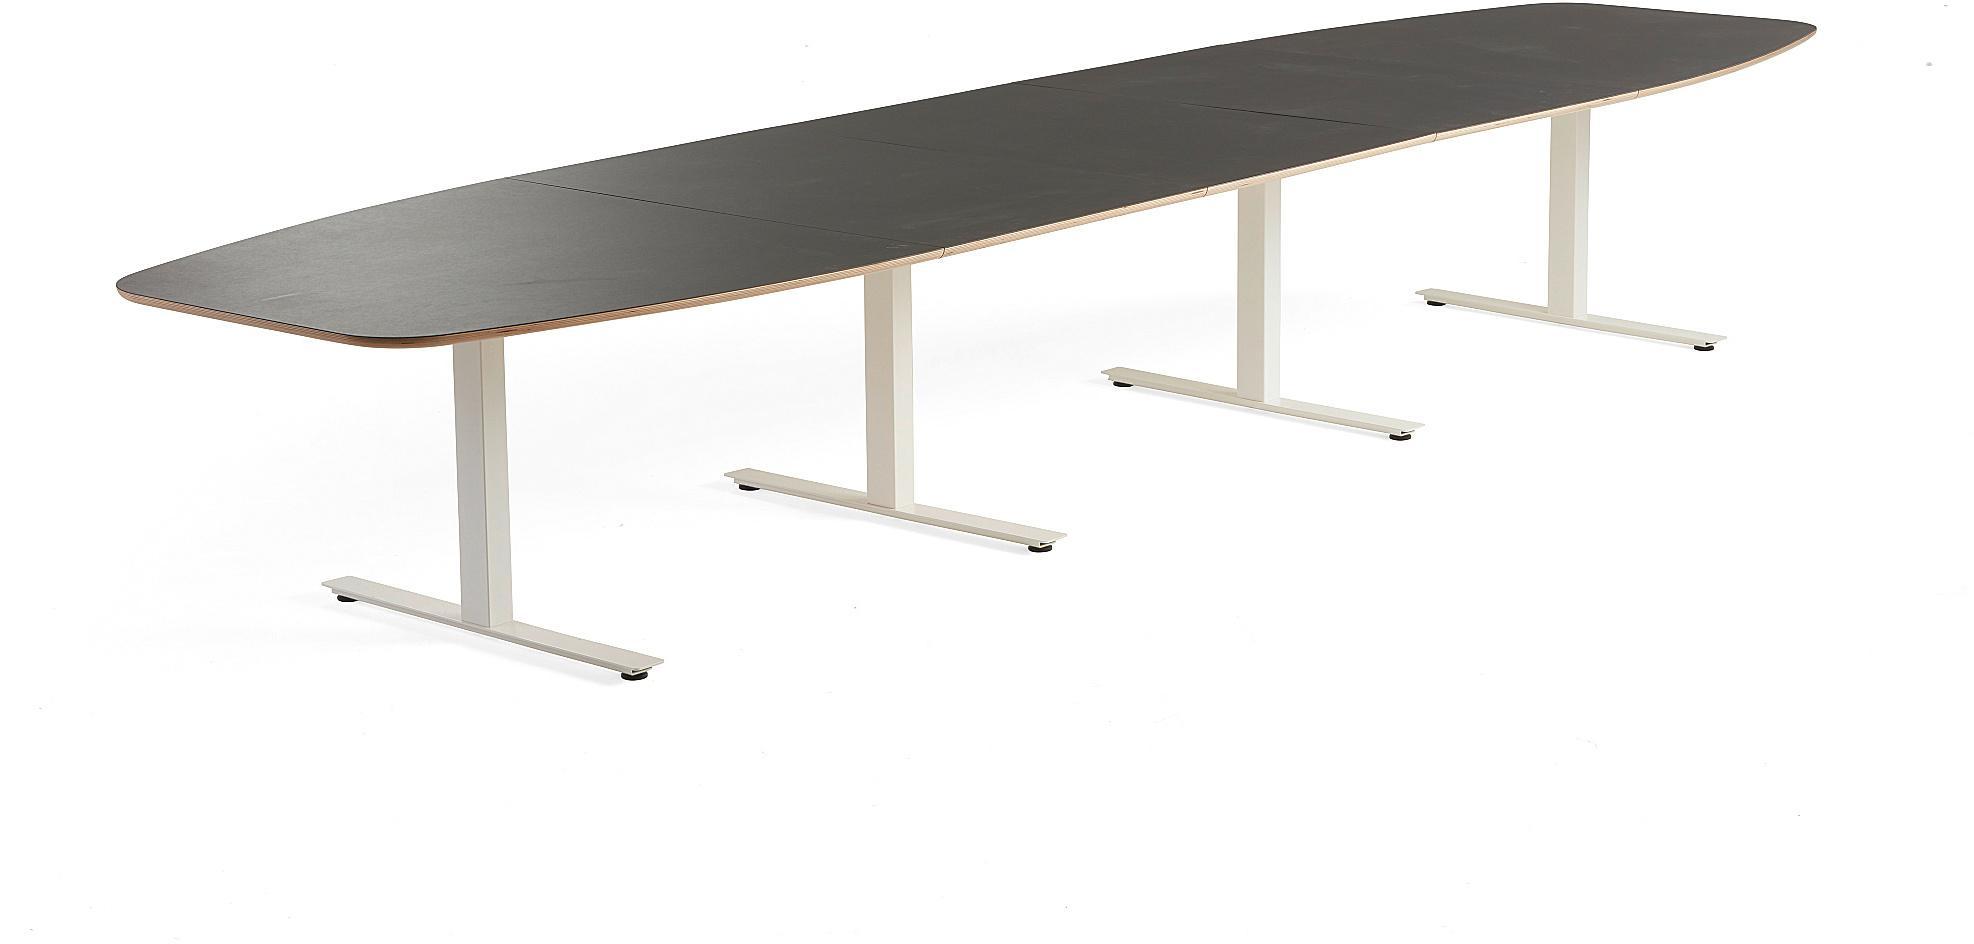 Rokovací stôl Audrey, 4800x1200 mm, biely podstavec, tmavošedá doska